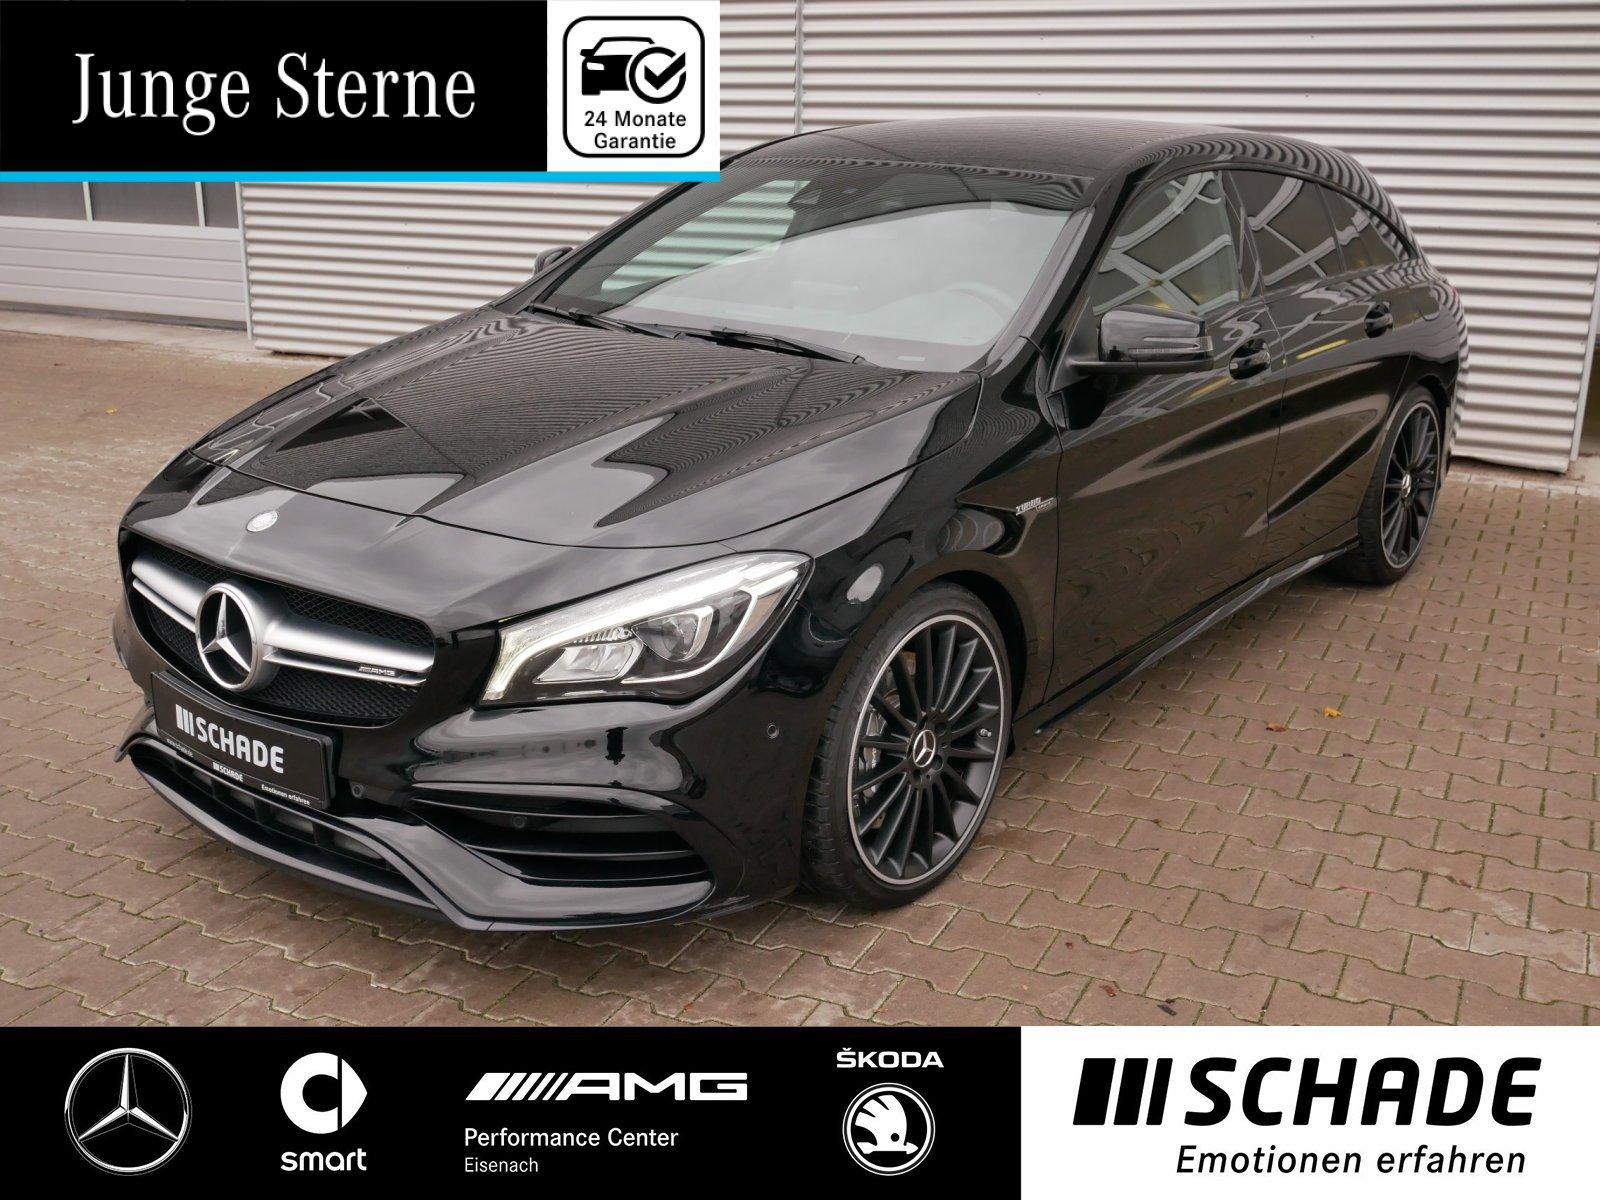 Mercedes-Benz CLA 45 4M SB Comand*LED*Night*Kamera*AppleCarPl., Jahr 2016, Benzin